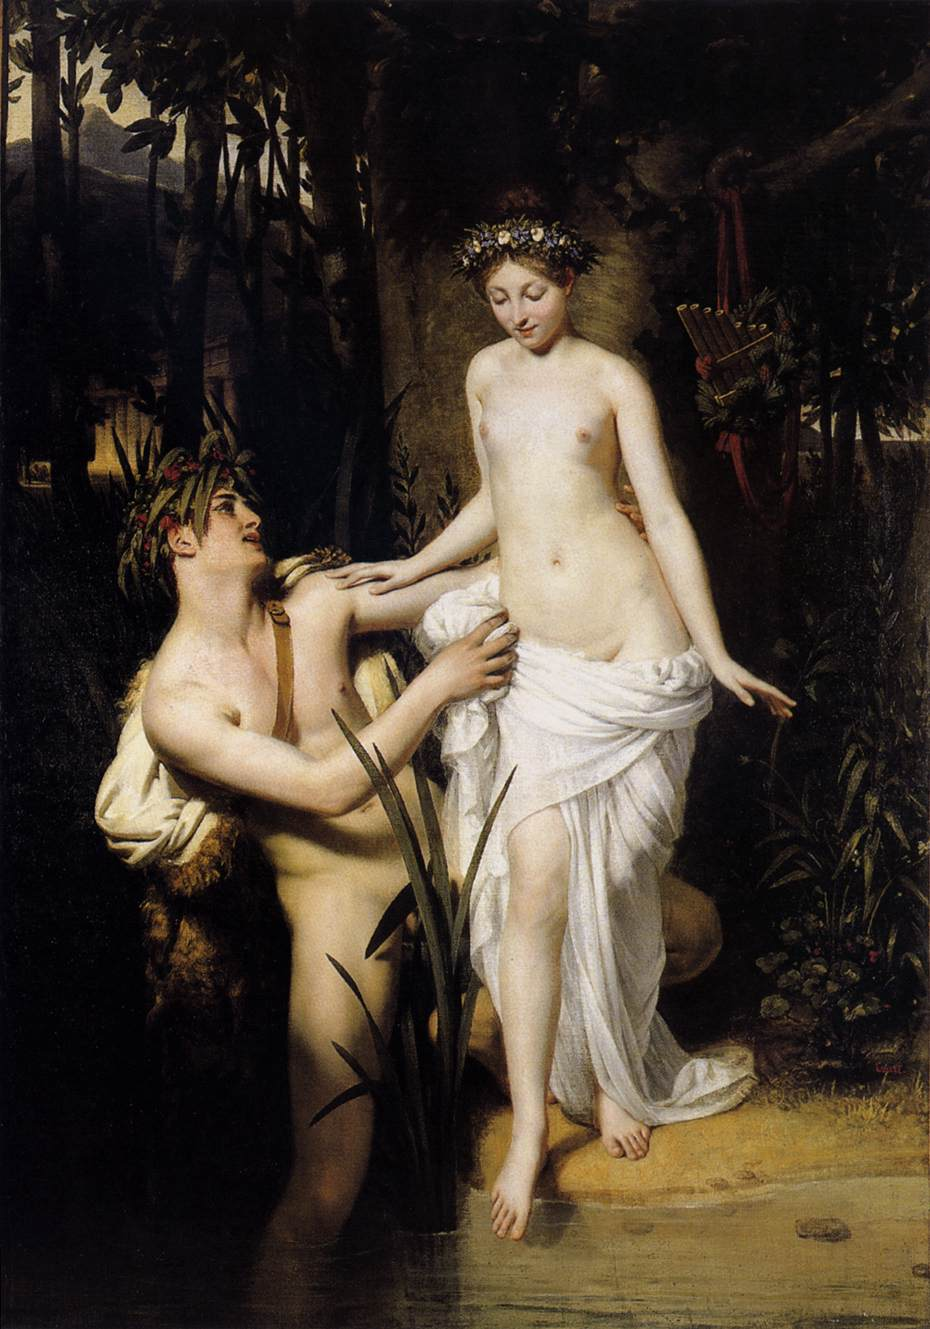 https://i0.wp.com/upload.wikimedia.org/wikipedia/commons/2/2d/Joseph_Desire_Court_Une_Jeune_fille.jpg